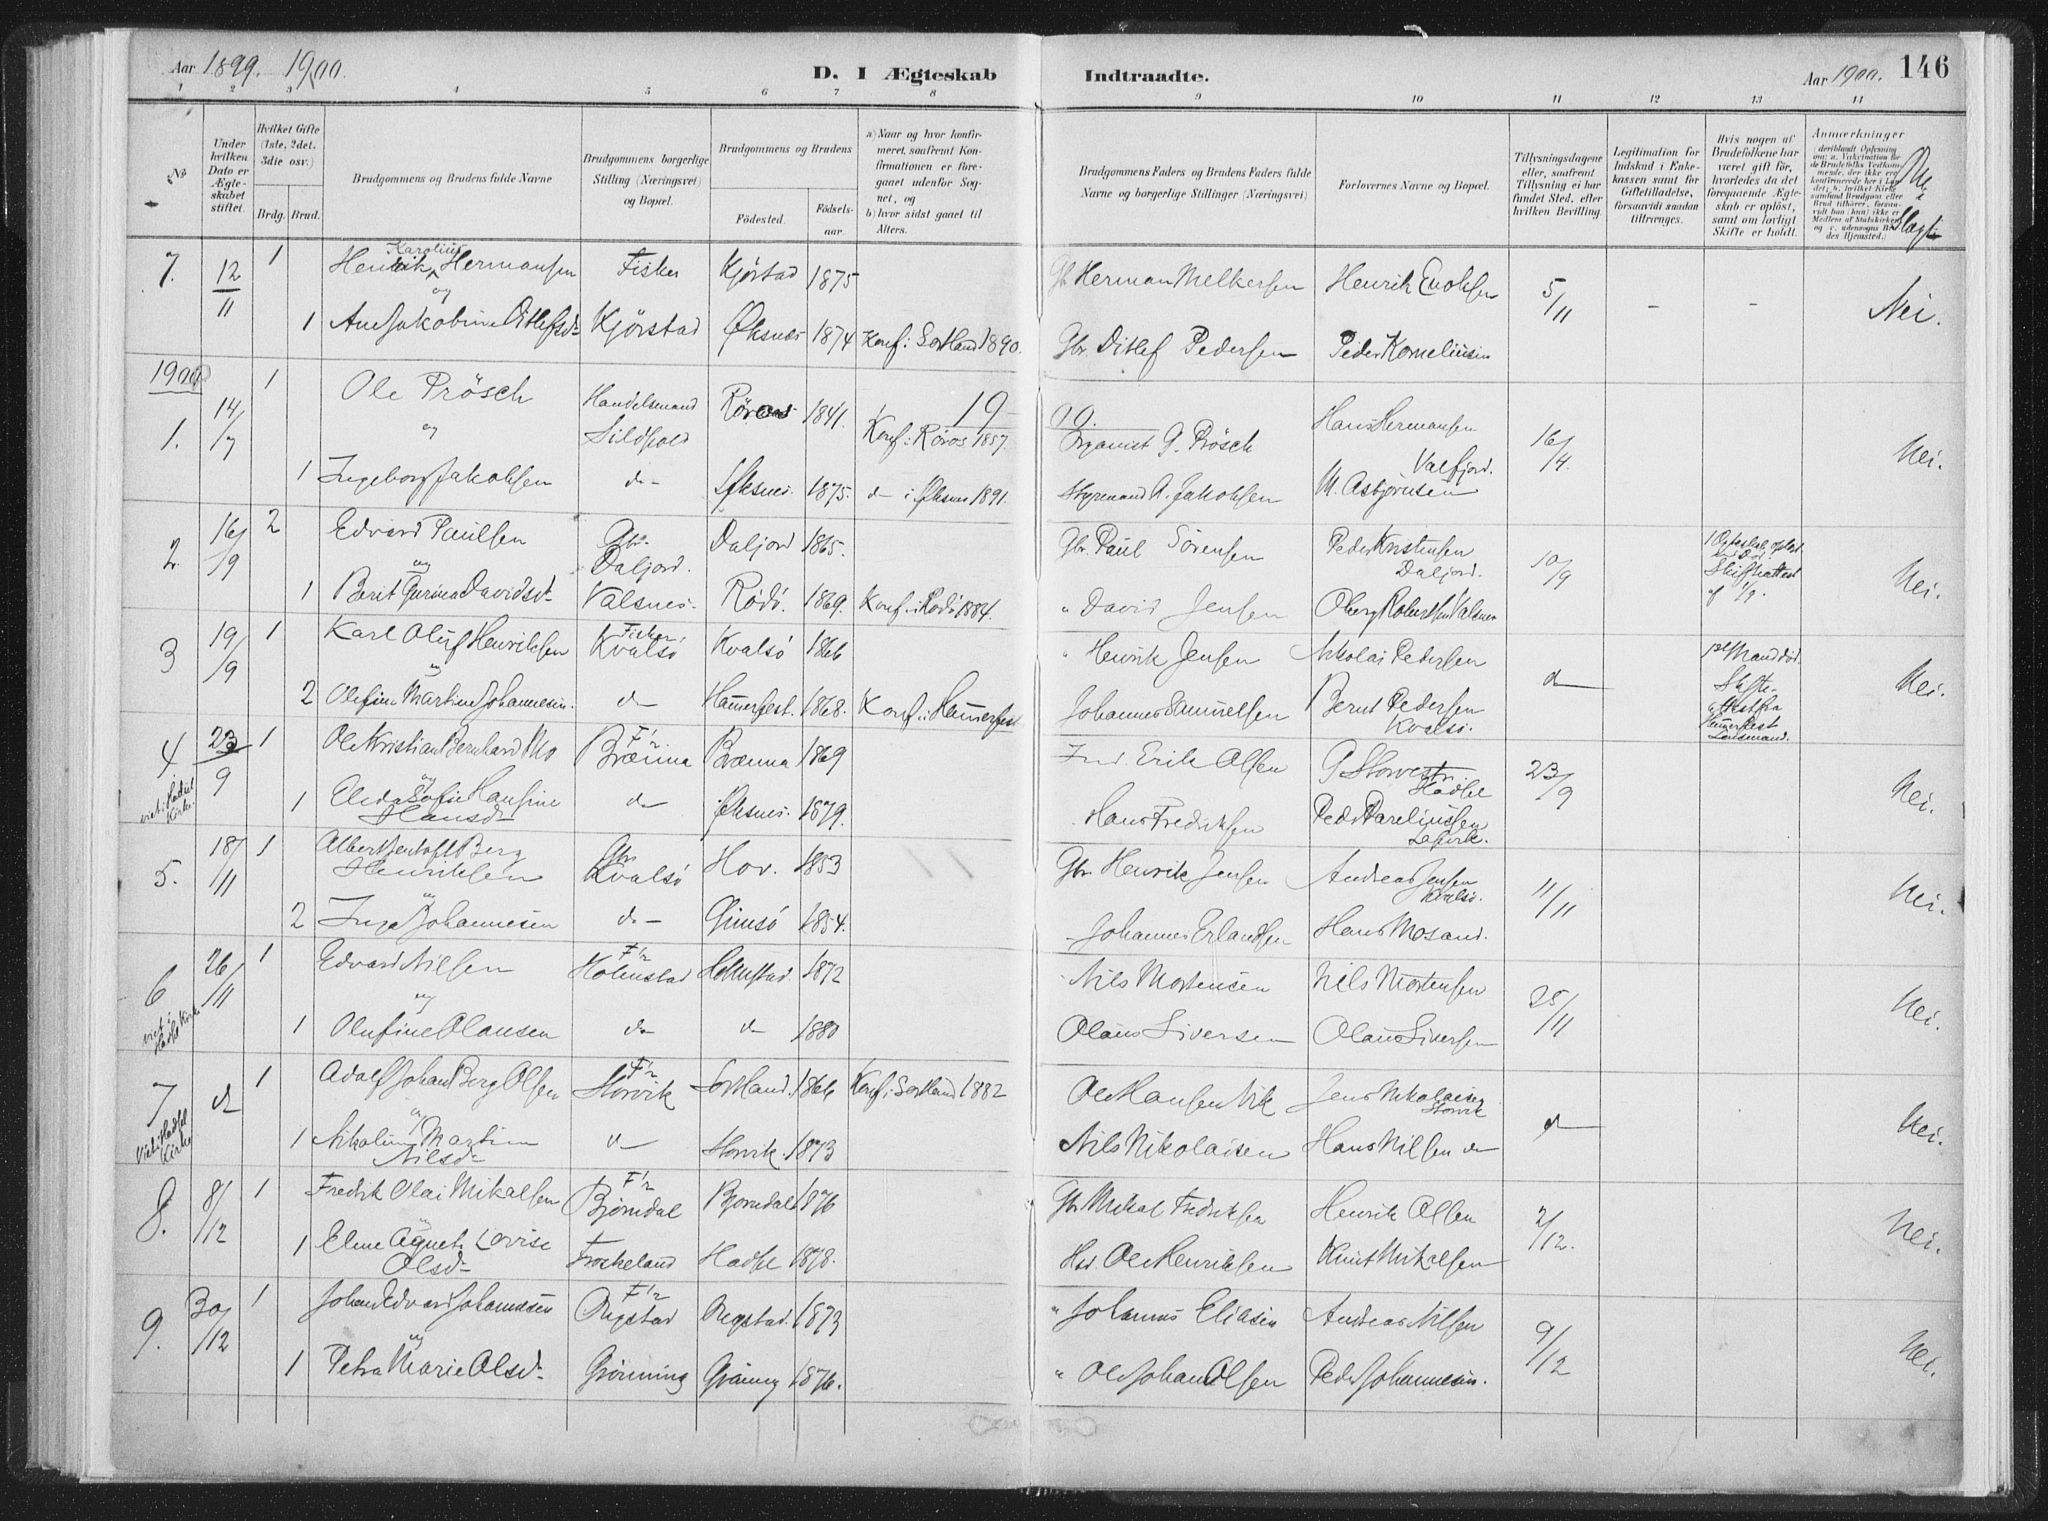 SAT, Ministerialprotokoller, klokkerbøker og fødselsregistre - Nordland, 890/L1286: Ministerialbok nr. 890A01, 1882-1902, s. 146